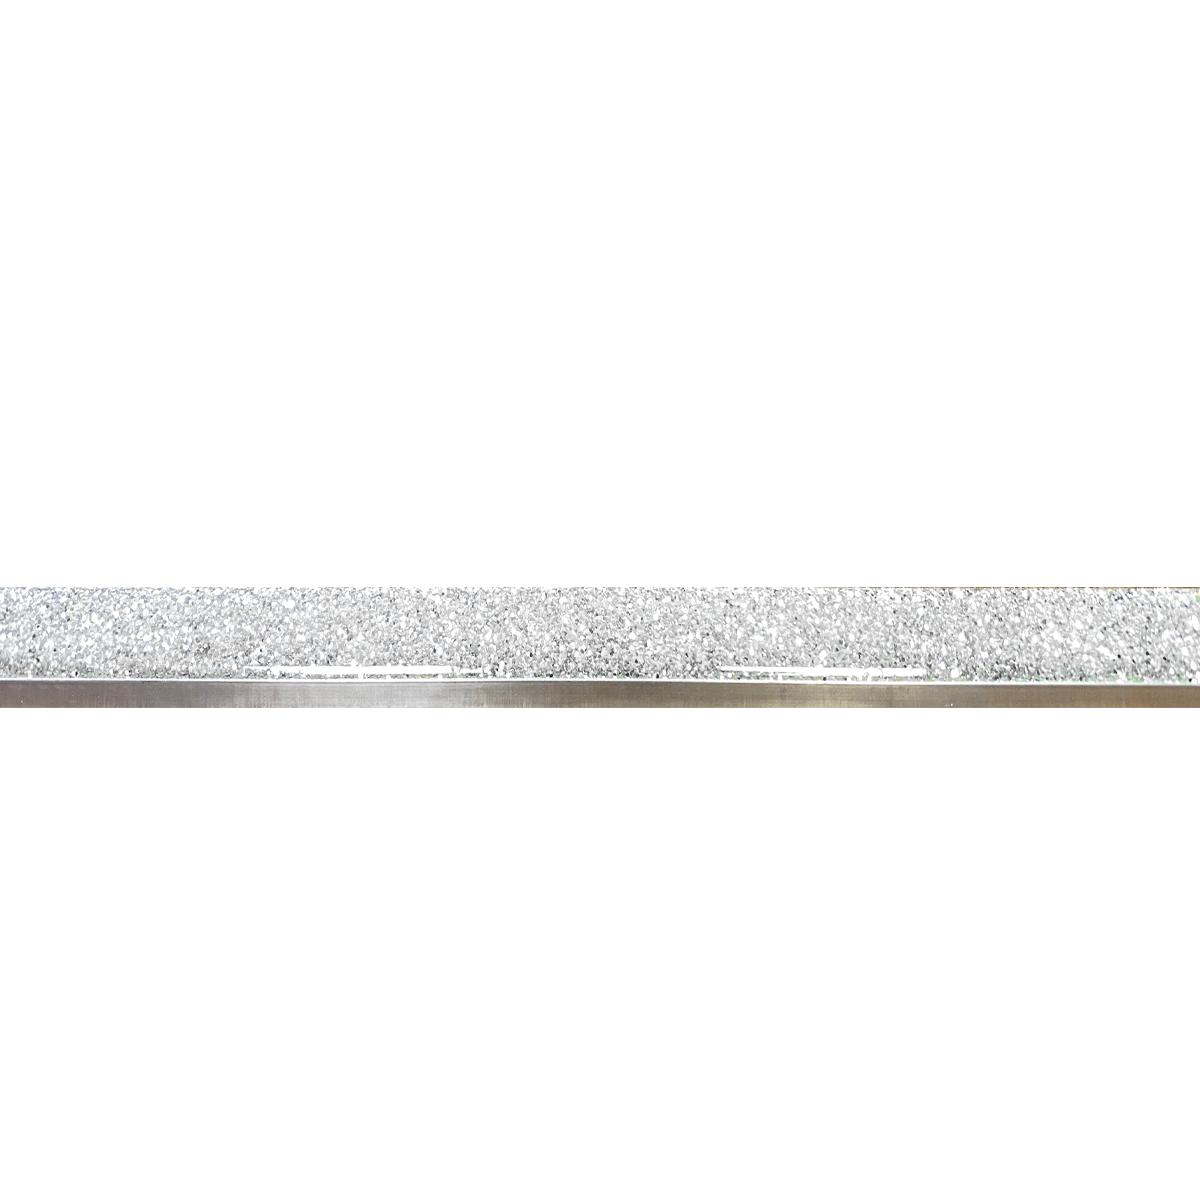 SPECTRA15 SPARKLE TRIM SILVER